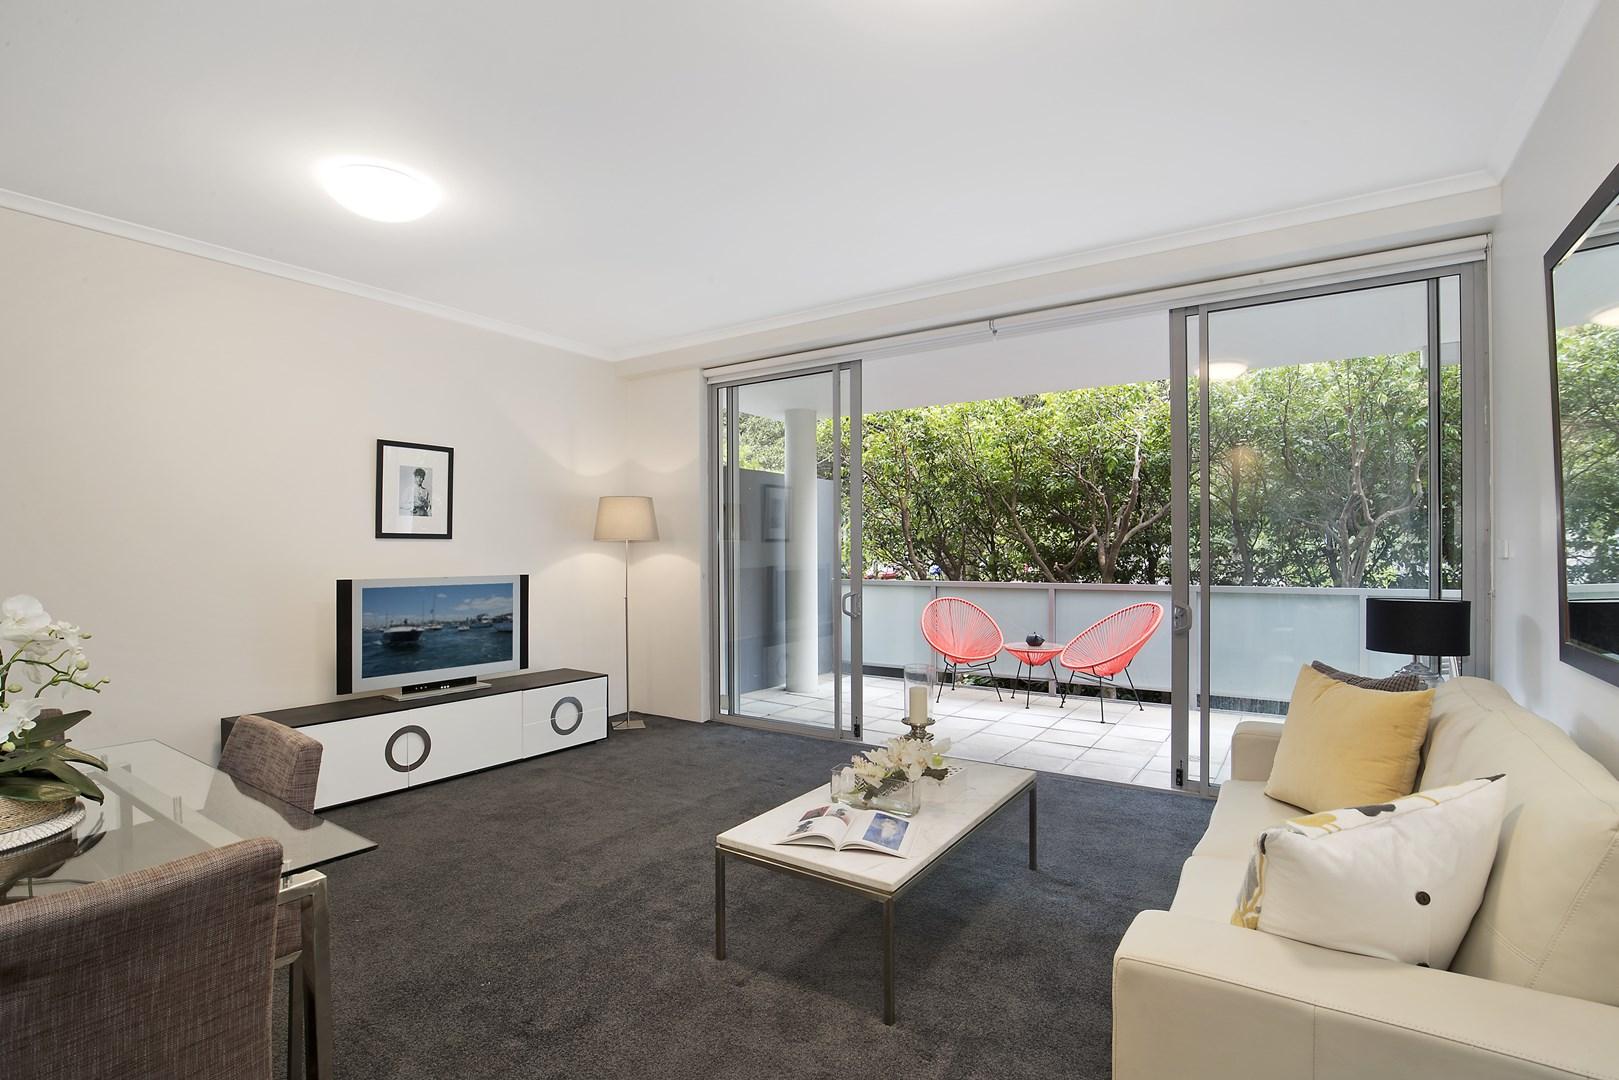 1 106 joynton avenue zetland nsw 2017 apartment for for Greens dining room zetland road bristol